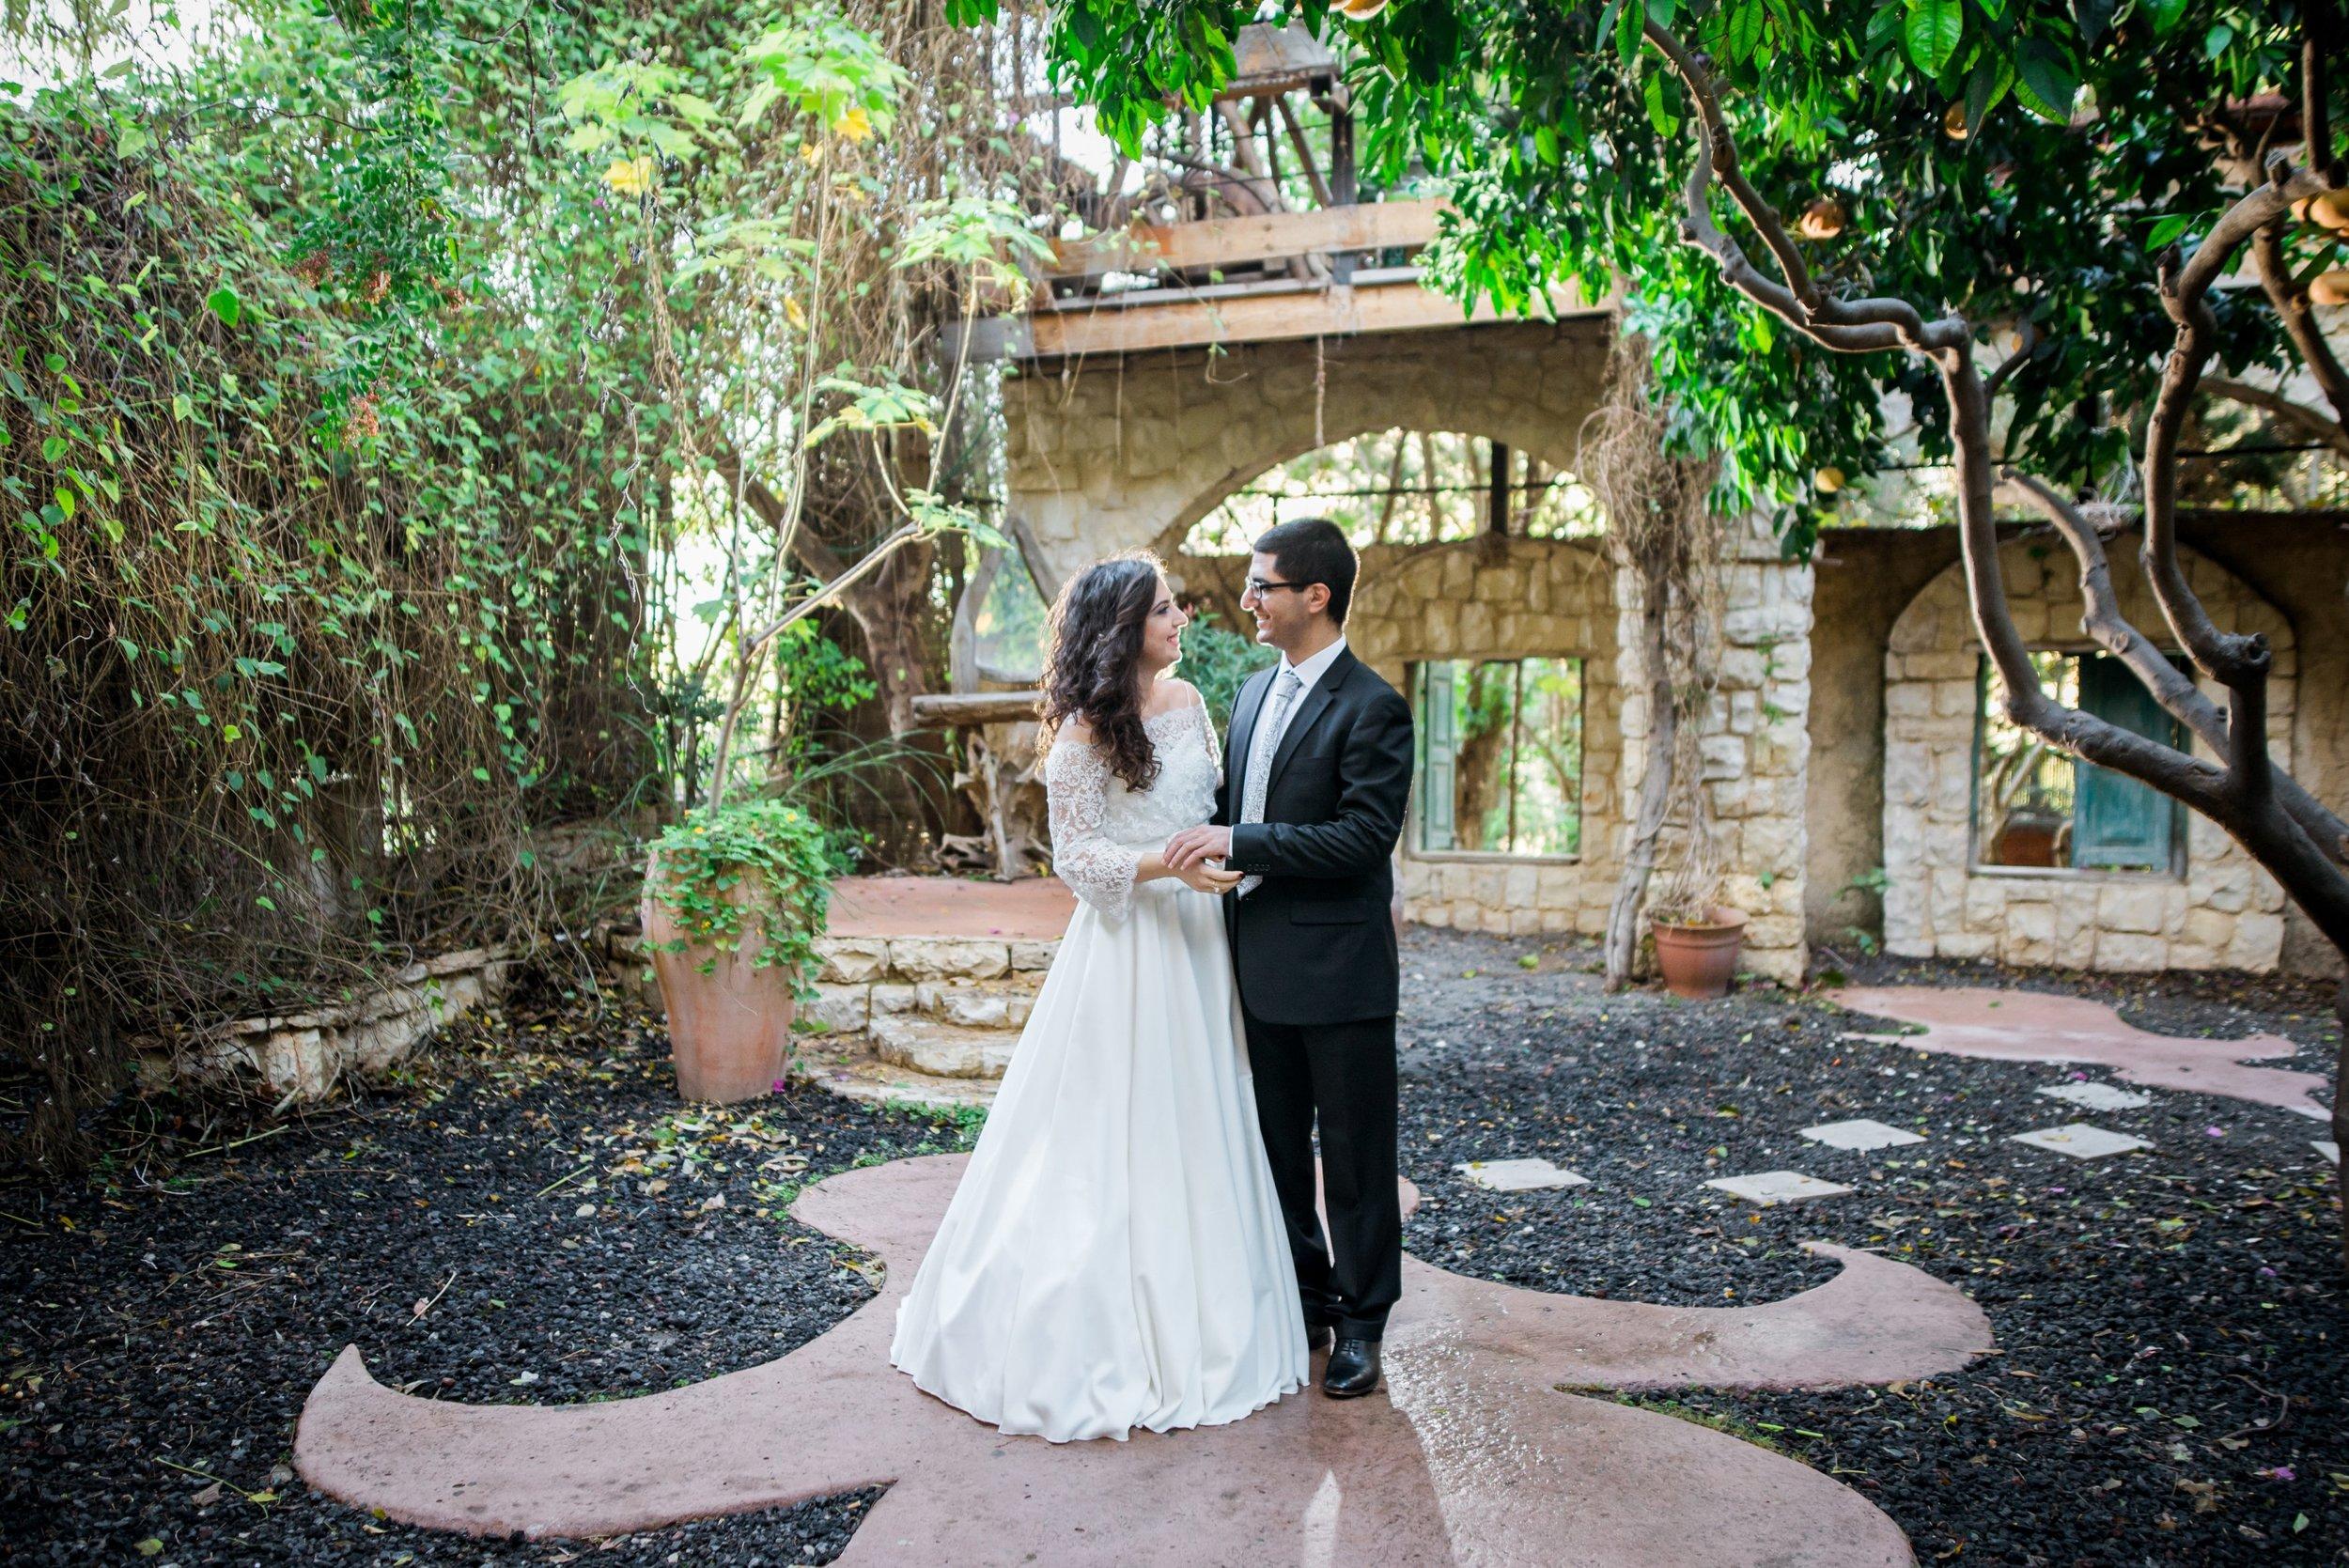 israel-garden-wedding-portraits-session-kate-giryes-photography-_WEB.jpg